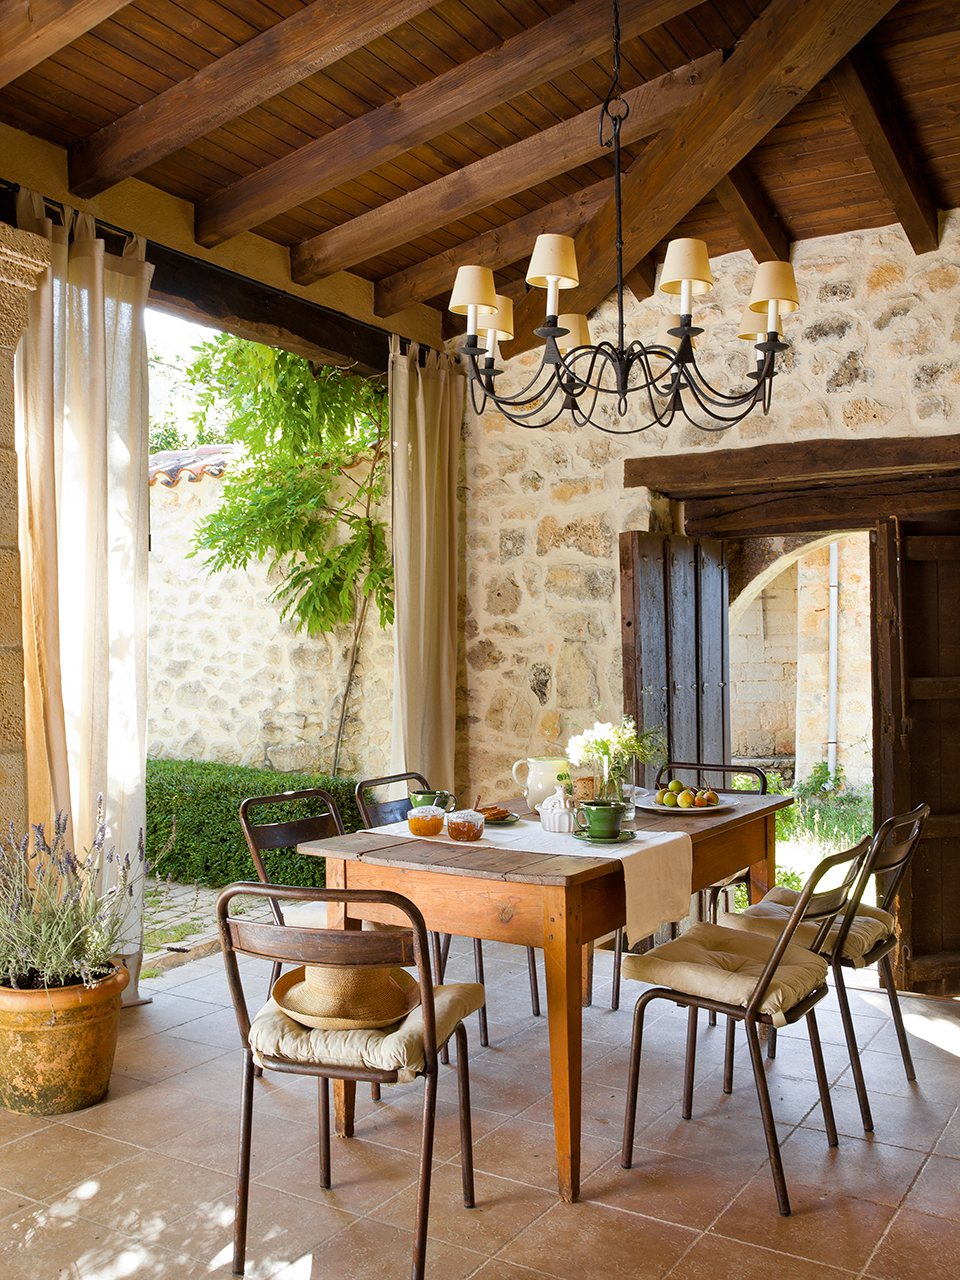 Mikel larrinaga for Ideas de terrazas rusticas